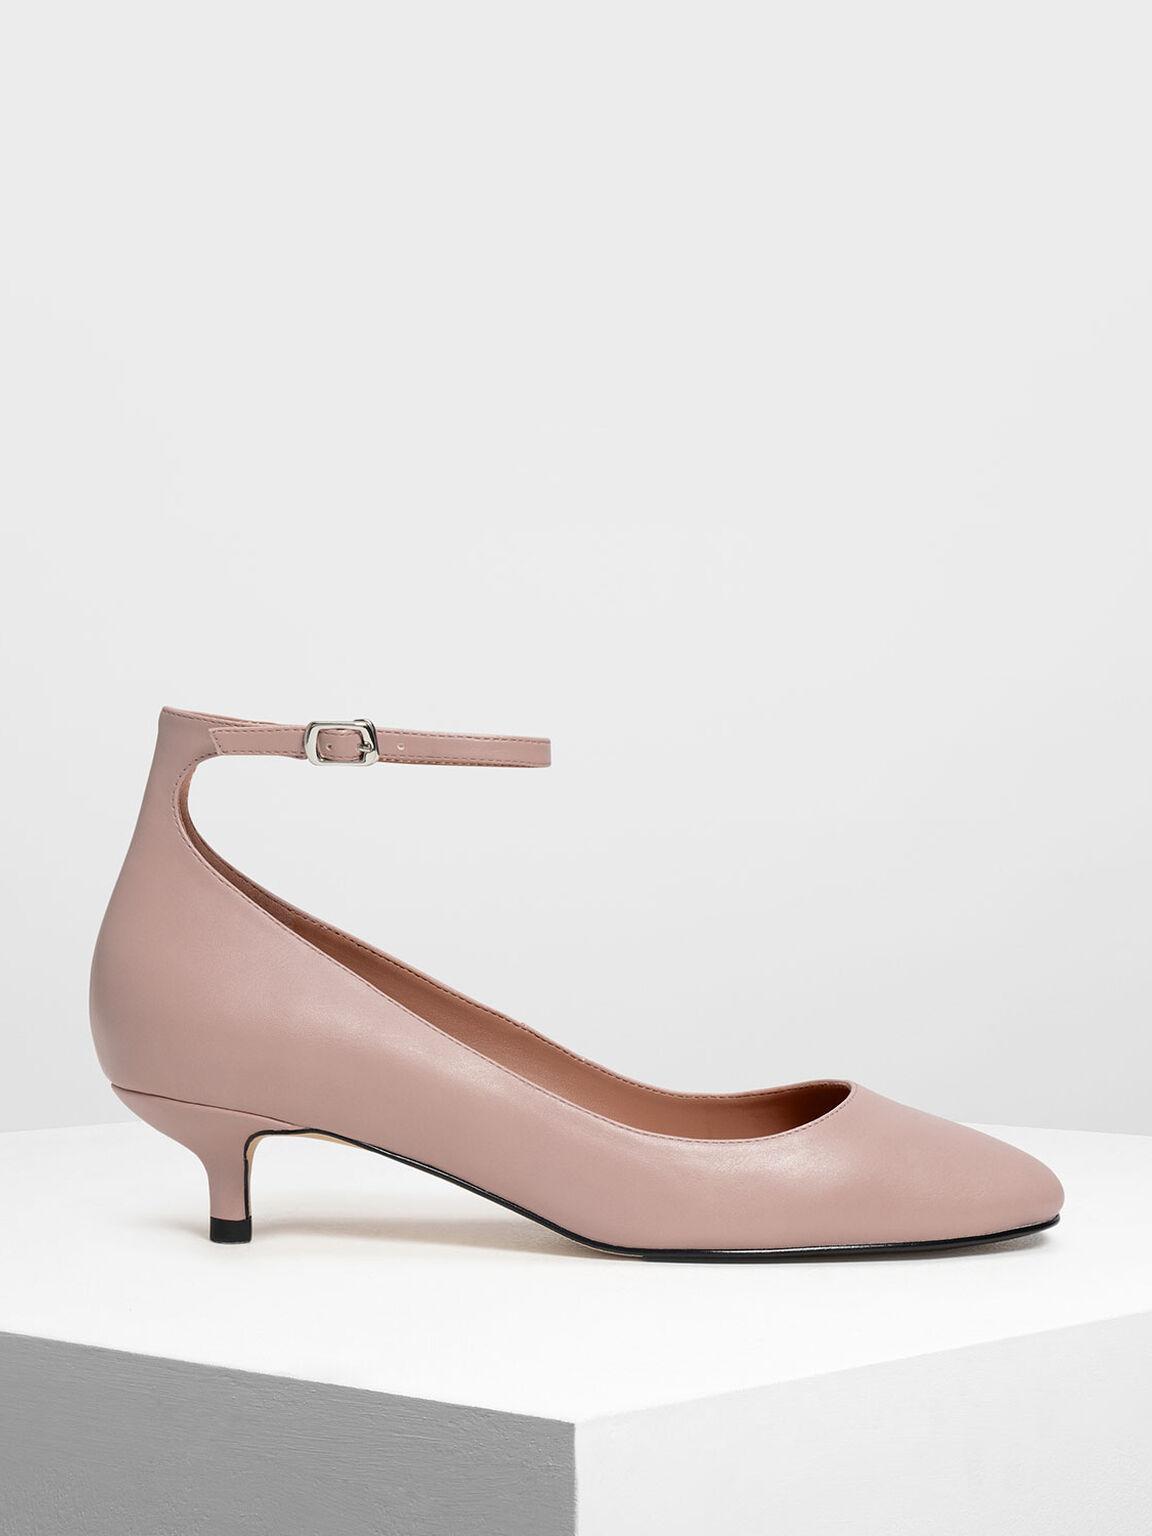 Round Toe Ankle Strap Pumps, Blush, hi-res